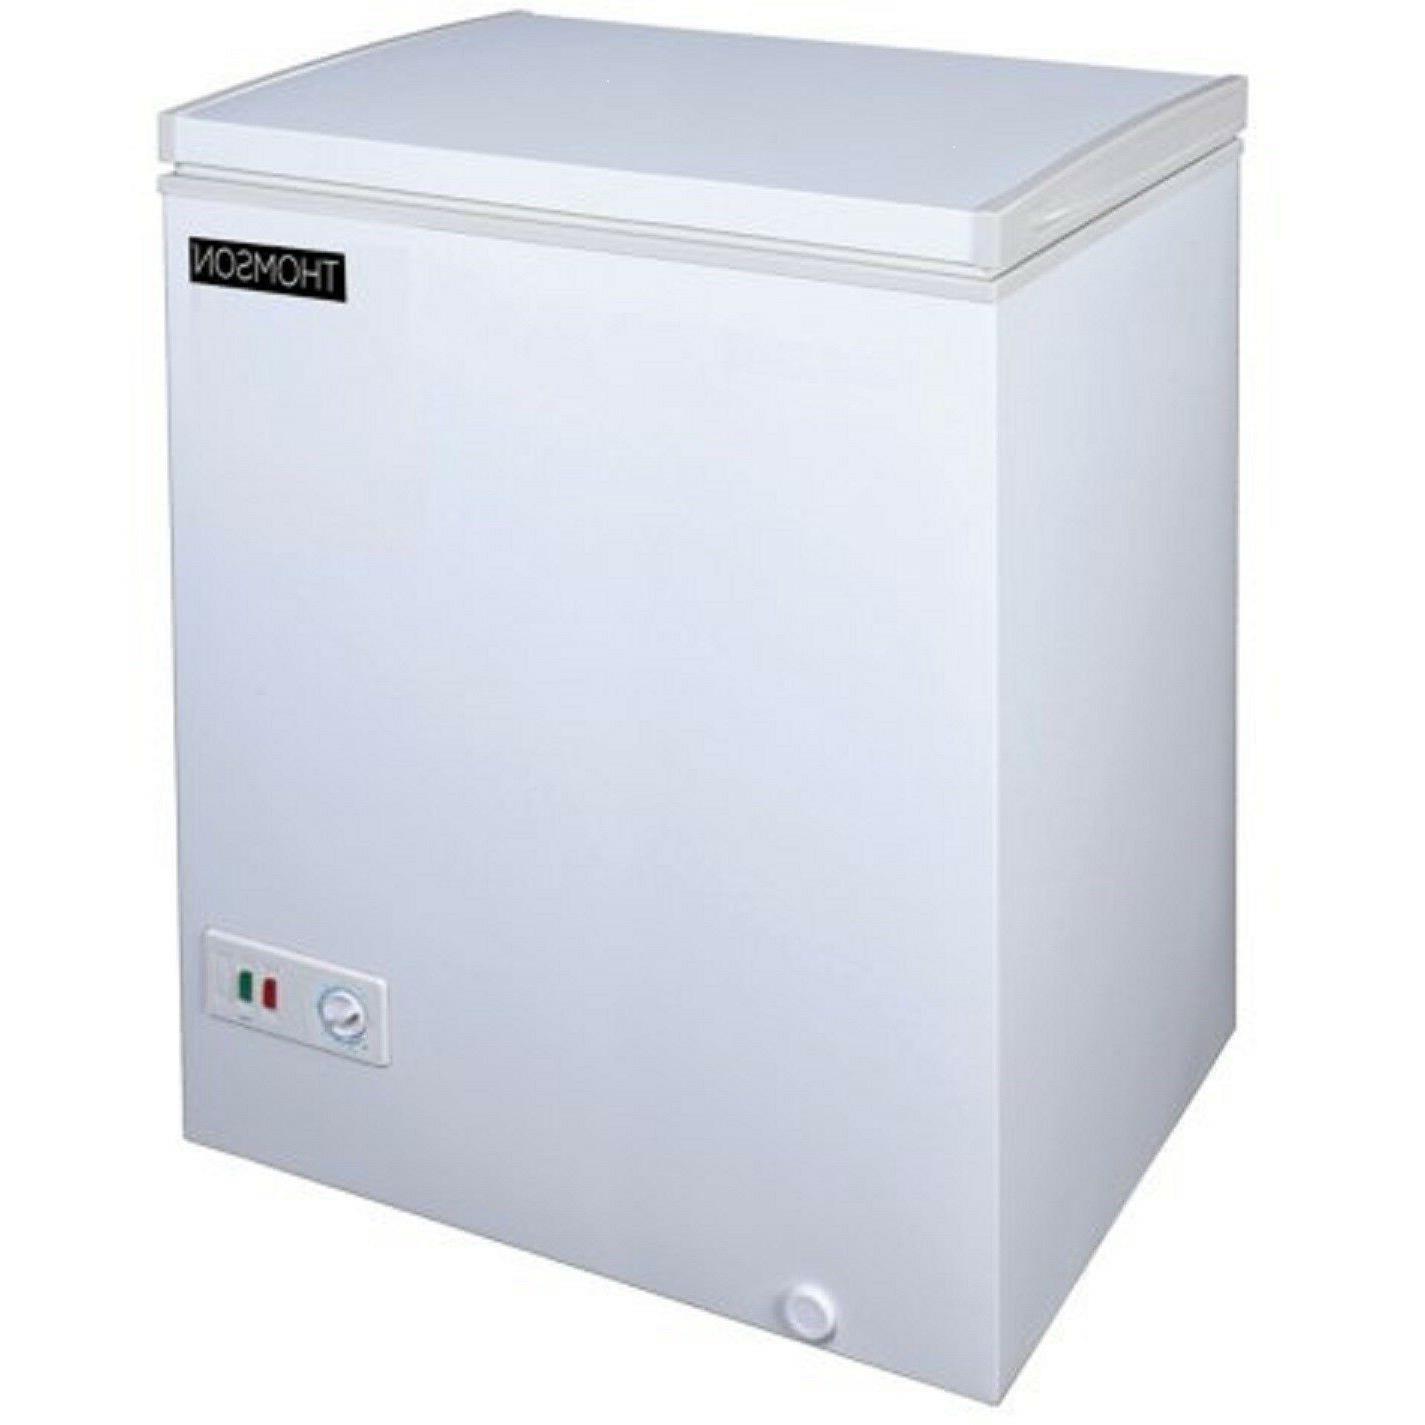 chest freezer 7 1 cu ft defrst